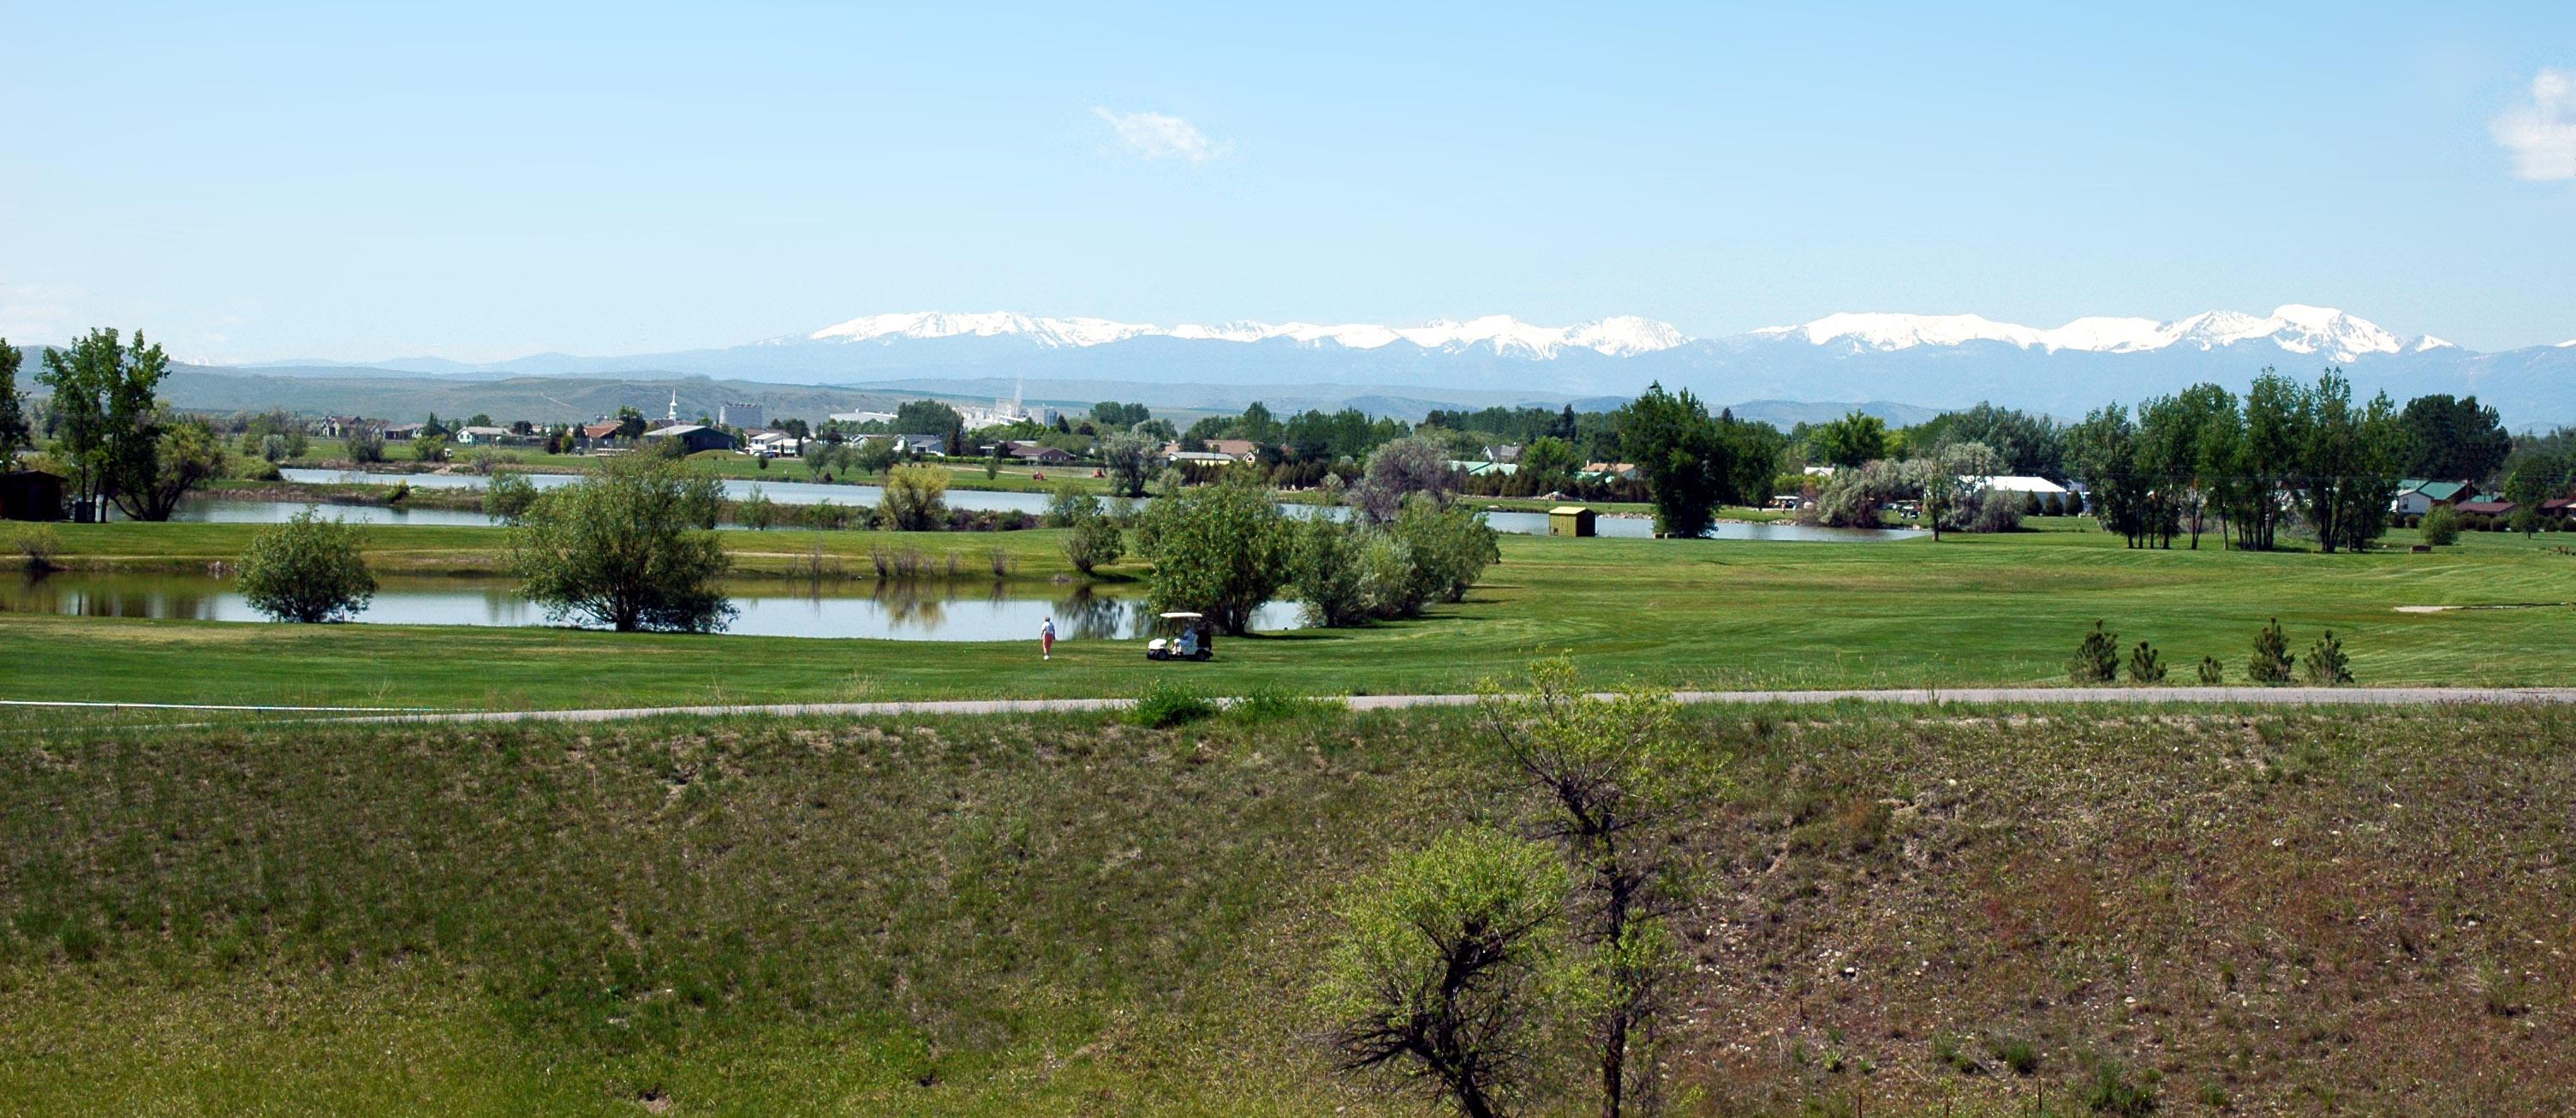 File:Three Forks, Montana.jpg - Wikimedia Commons: commons.wikimedia.org/wiki/file:three_forks,_montana.jpg